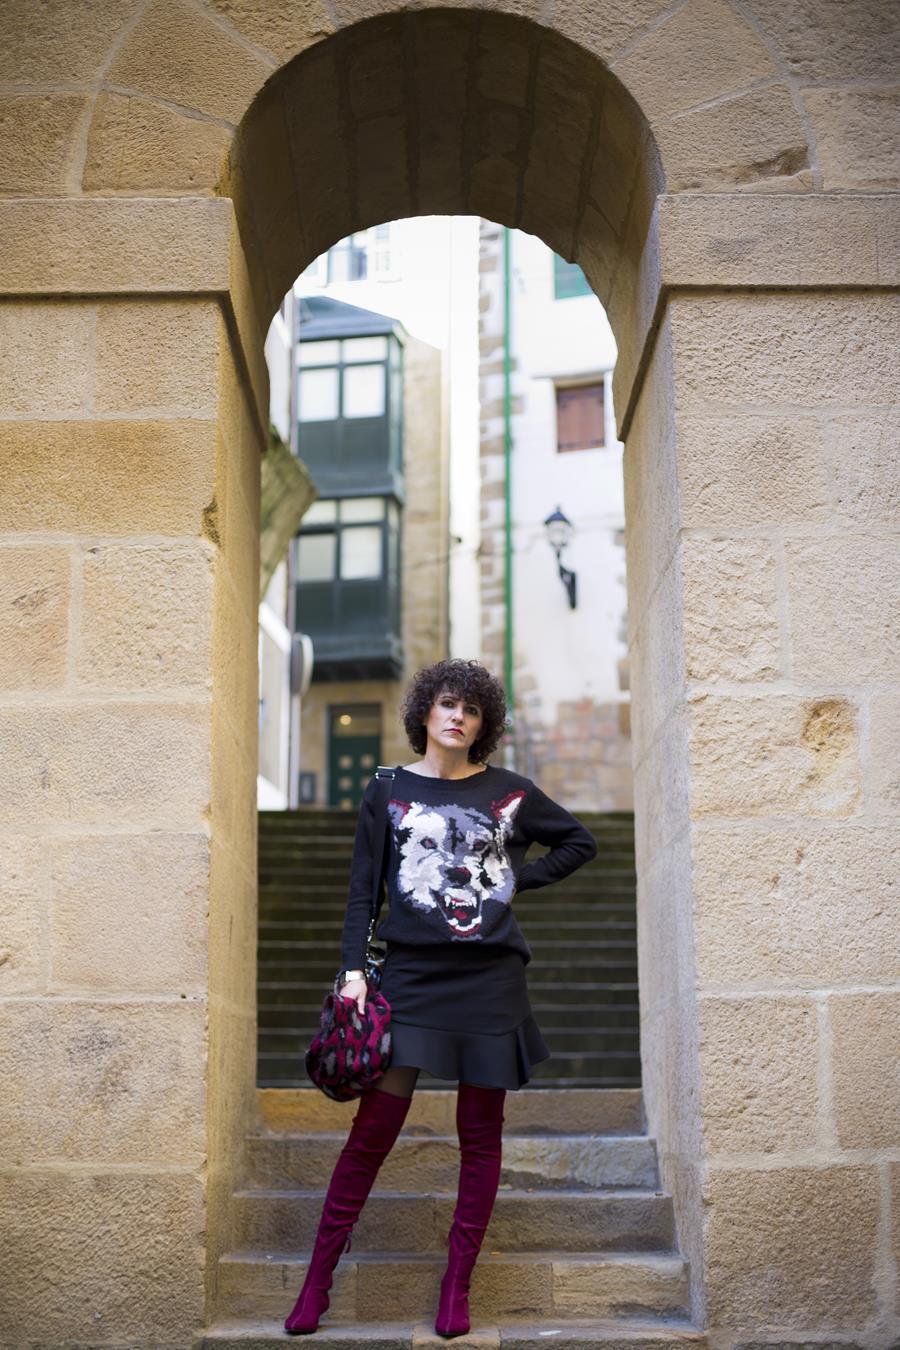 Rebeca Valdivia, asesora de imagen, personal shopper, estilista, stilist, Donostia, San Sebastián, Miss Clov, curls, rizos, botas calcetín, otk boots, frills skirt, falda volante, jersey lana, wool sweter, animal print, Zumaia